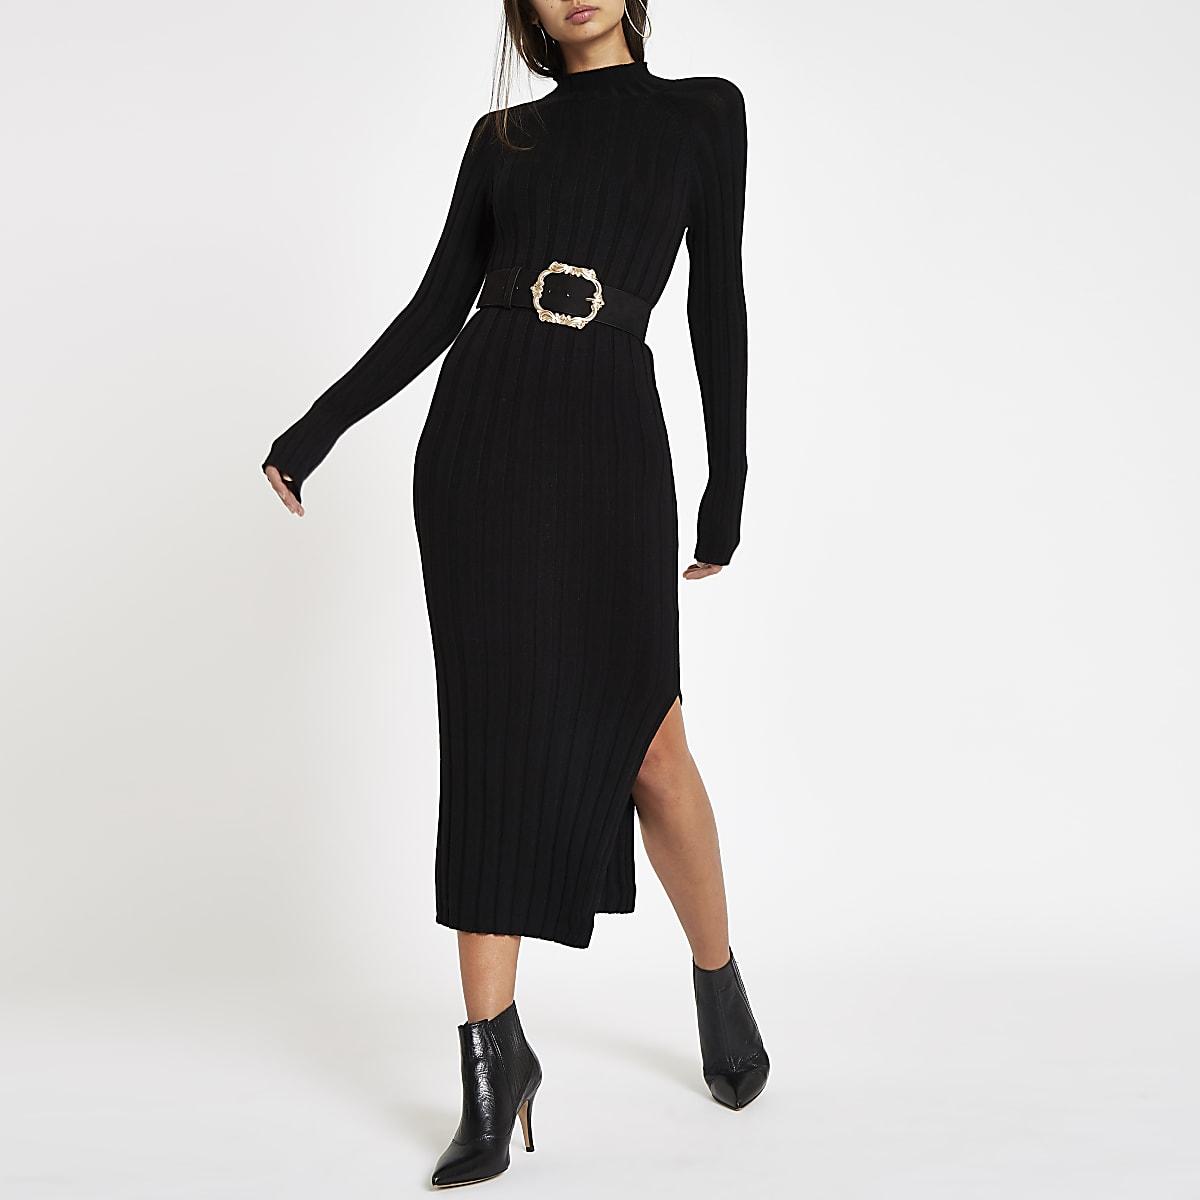 Black ribbed knit roll neck bodycon dress